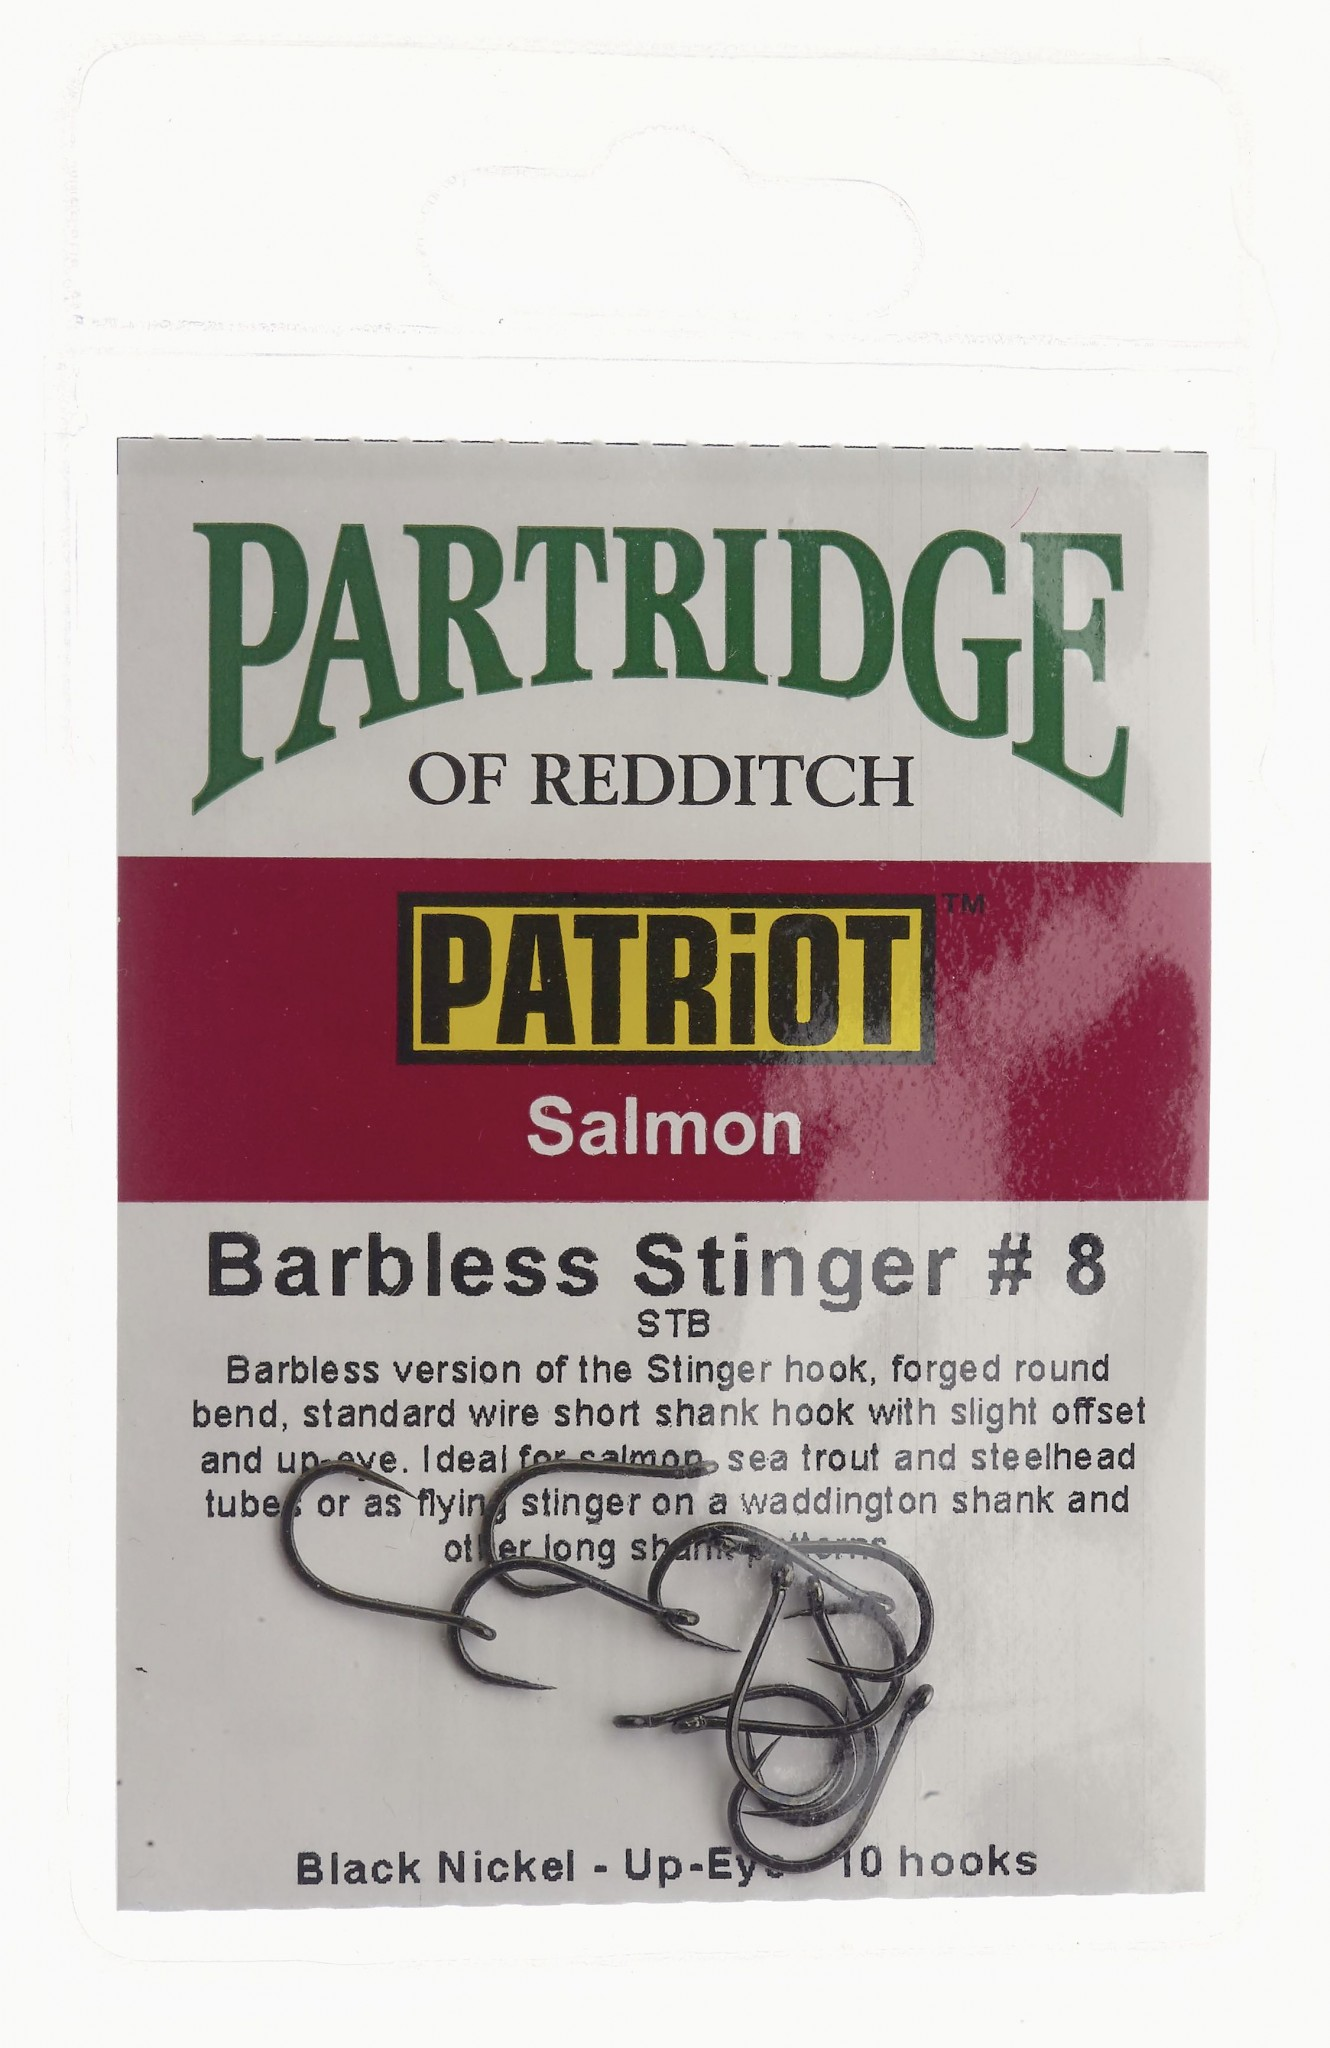 Patriot Barbless Stinger # 8 Partridge